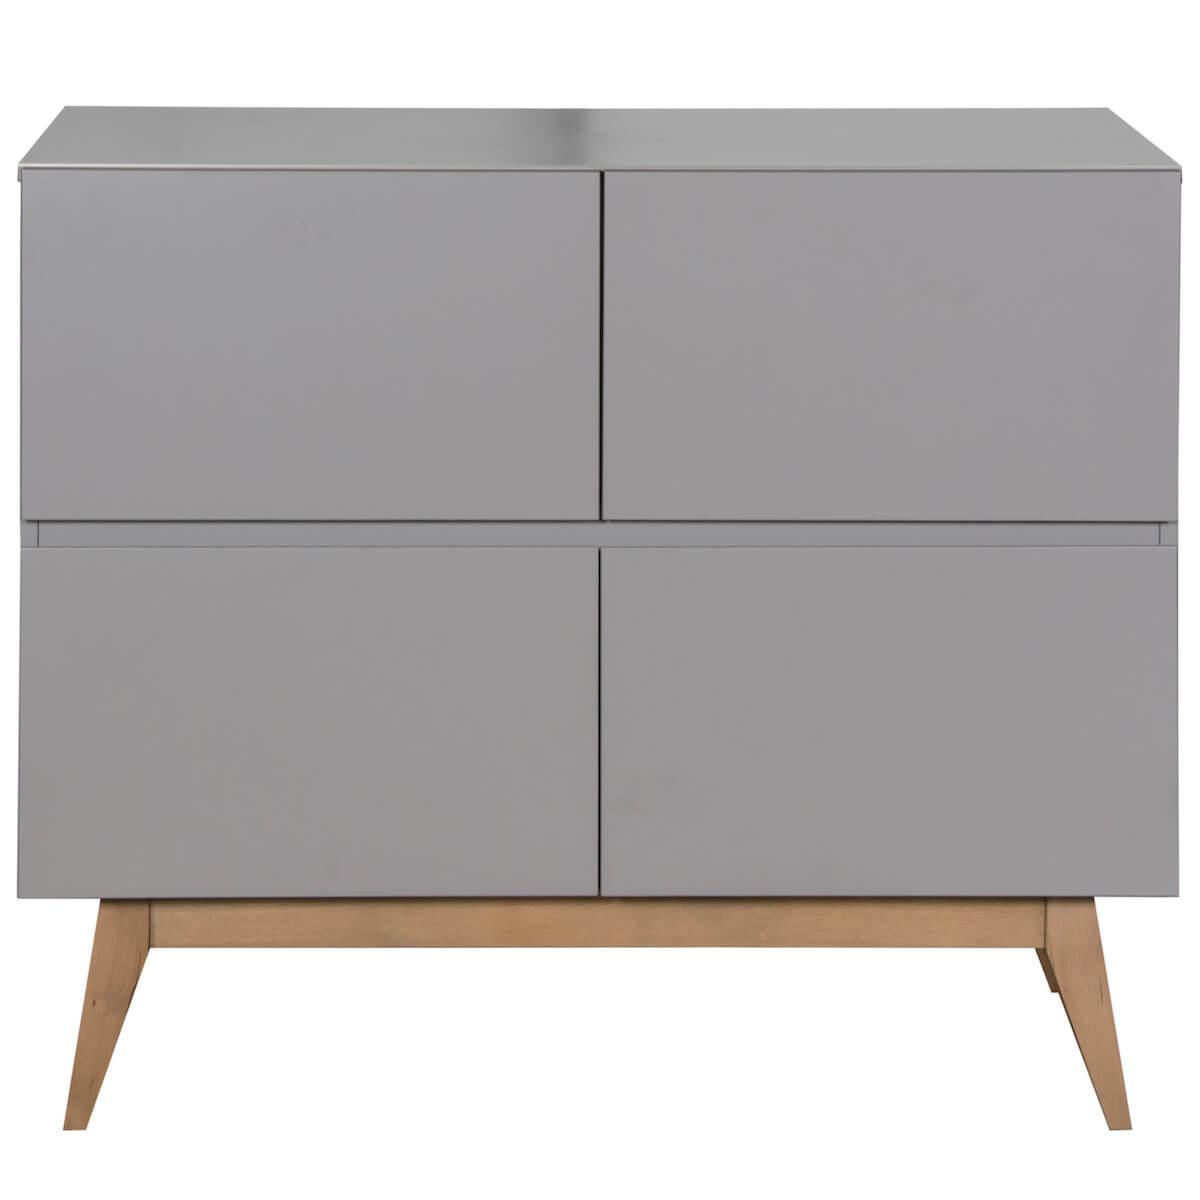 Kommode 110x90cm TRENDY Quax griffin grey